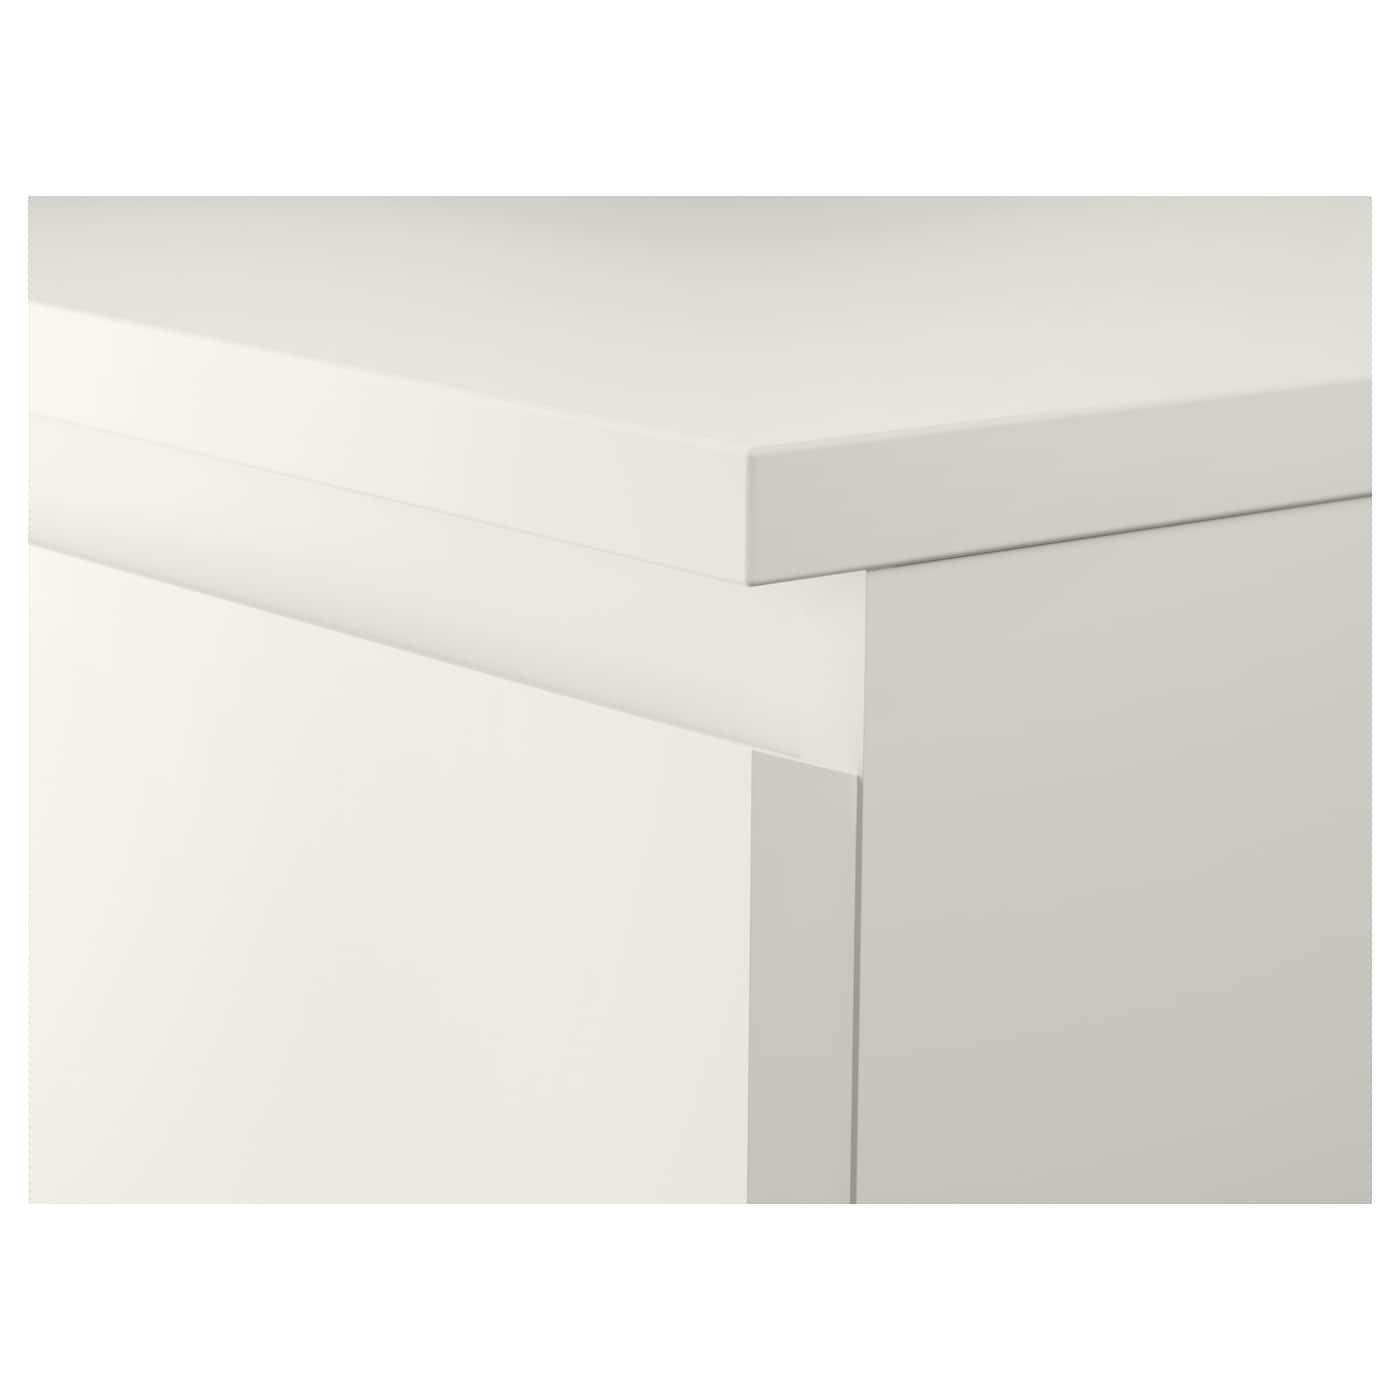 "MALM 6-drawer chest, white, 31 1/2x48 3/8 """